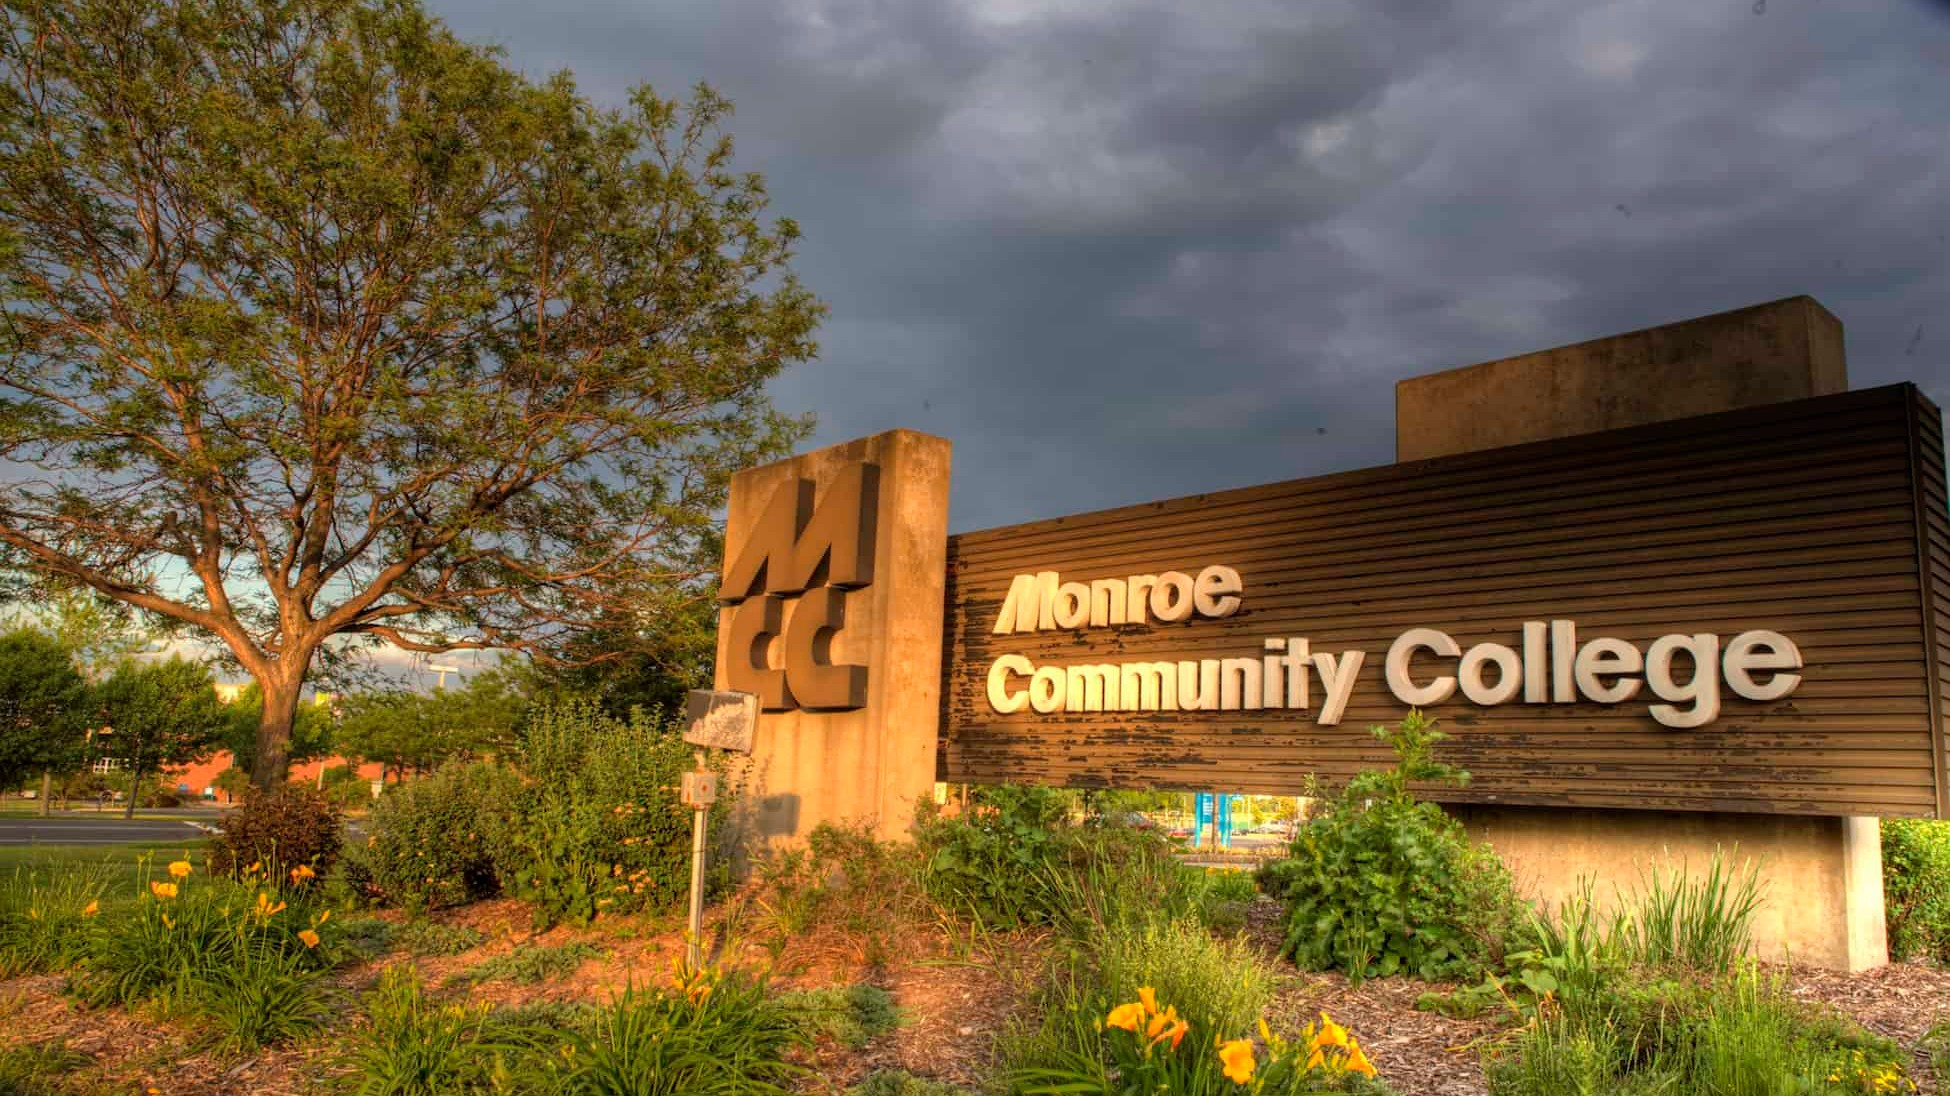 monroe community college - HD1950×1096